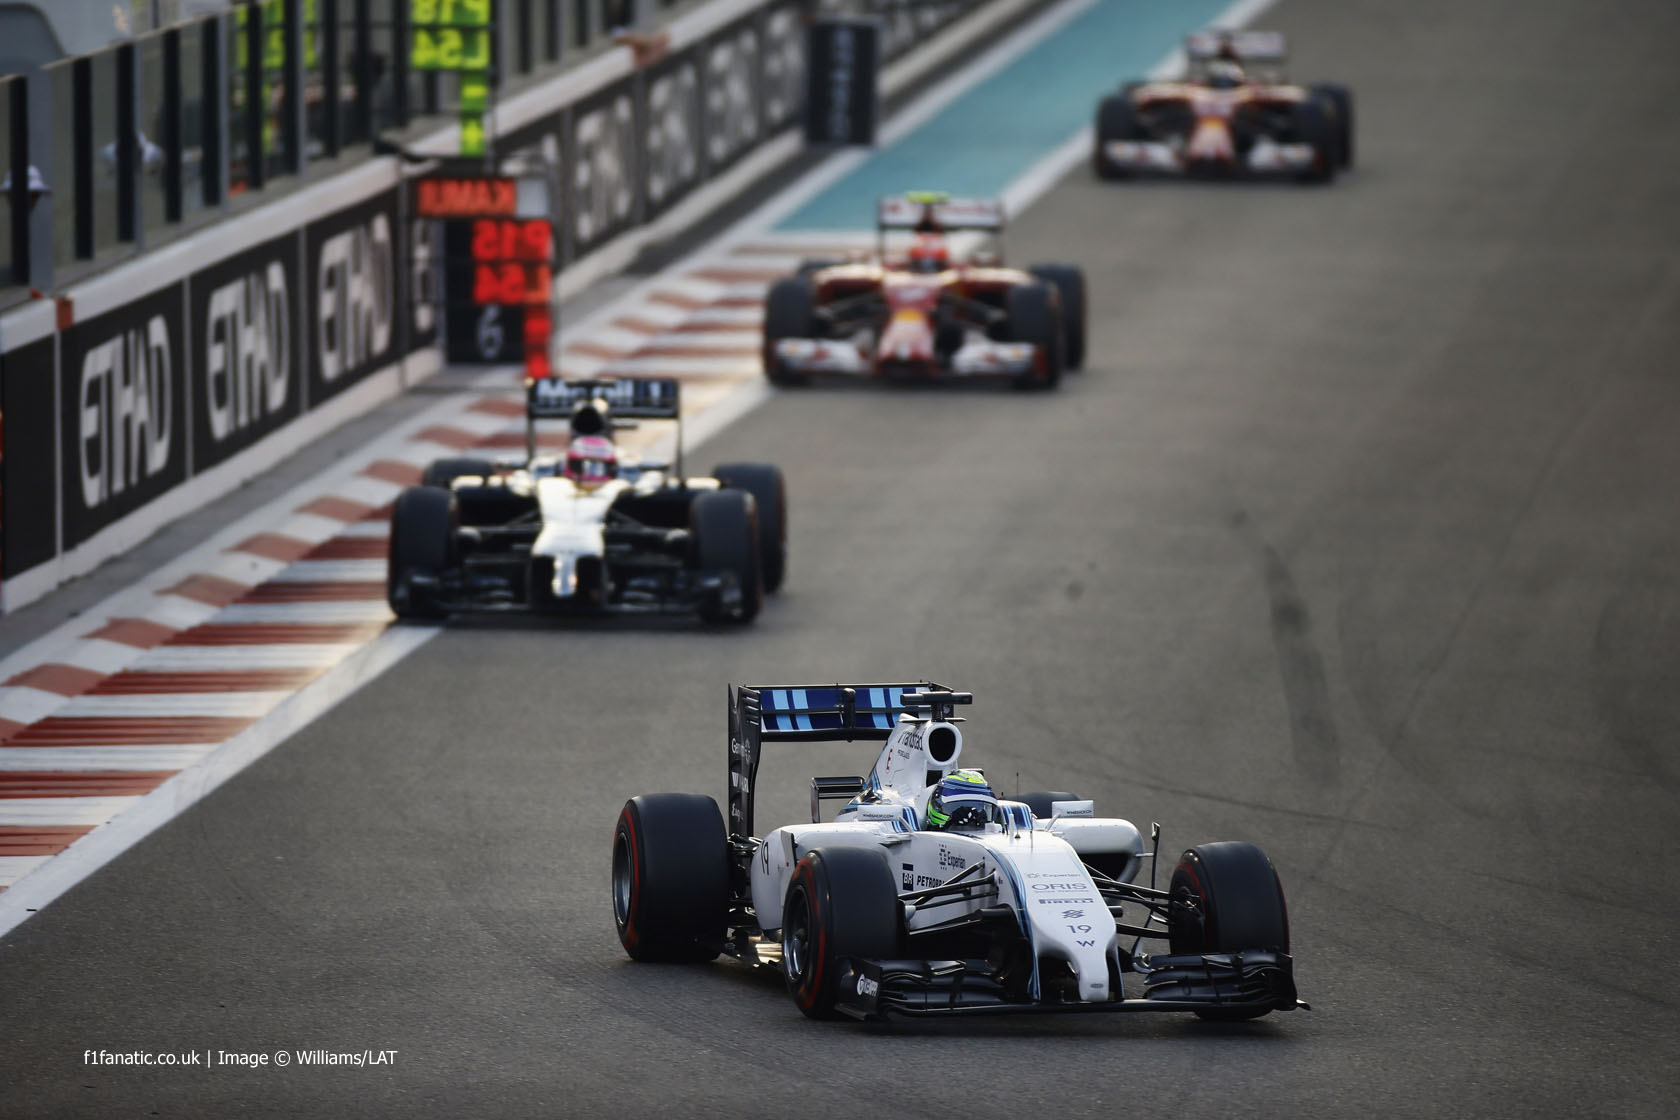 Felipe Massa, Williams, Yas Marina, 2014